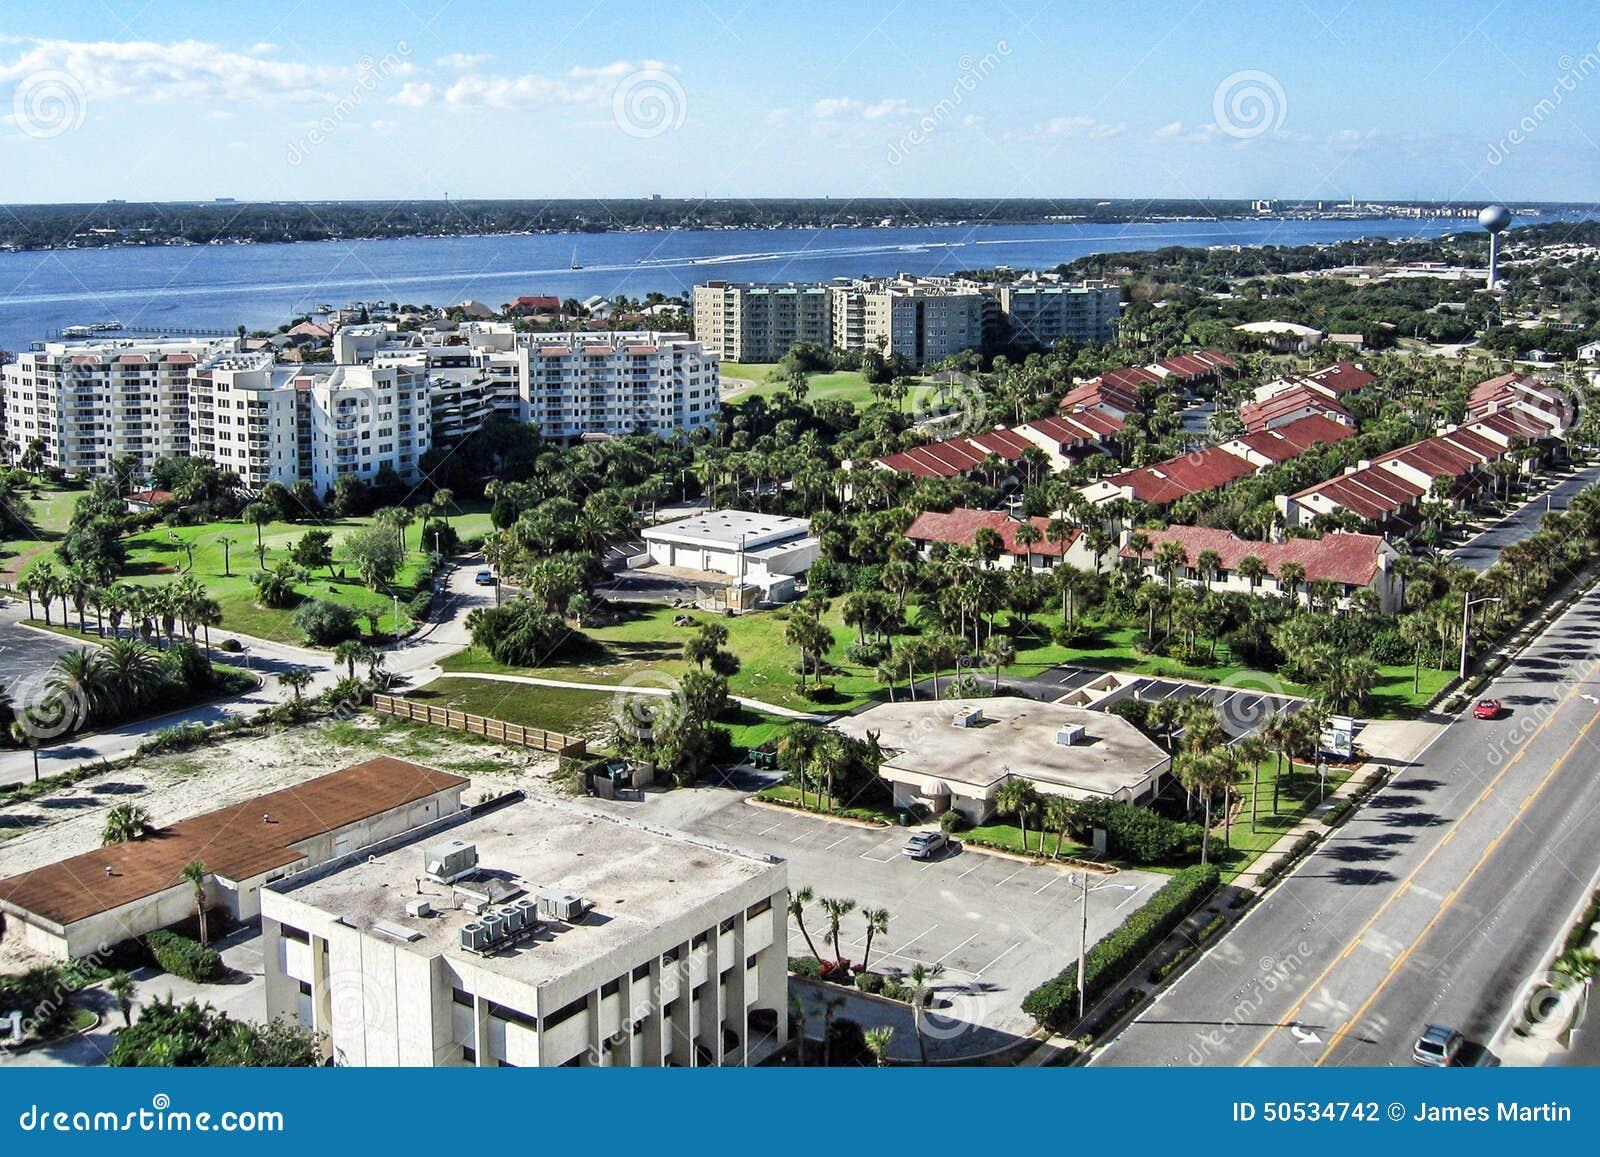 Aerial view of Daytona Beach Shores, Florida